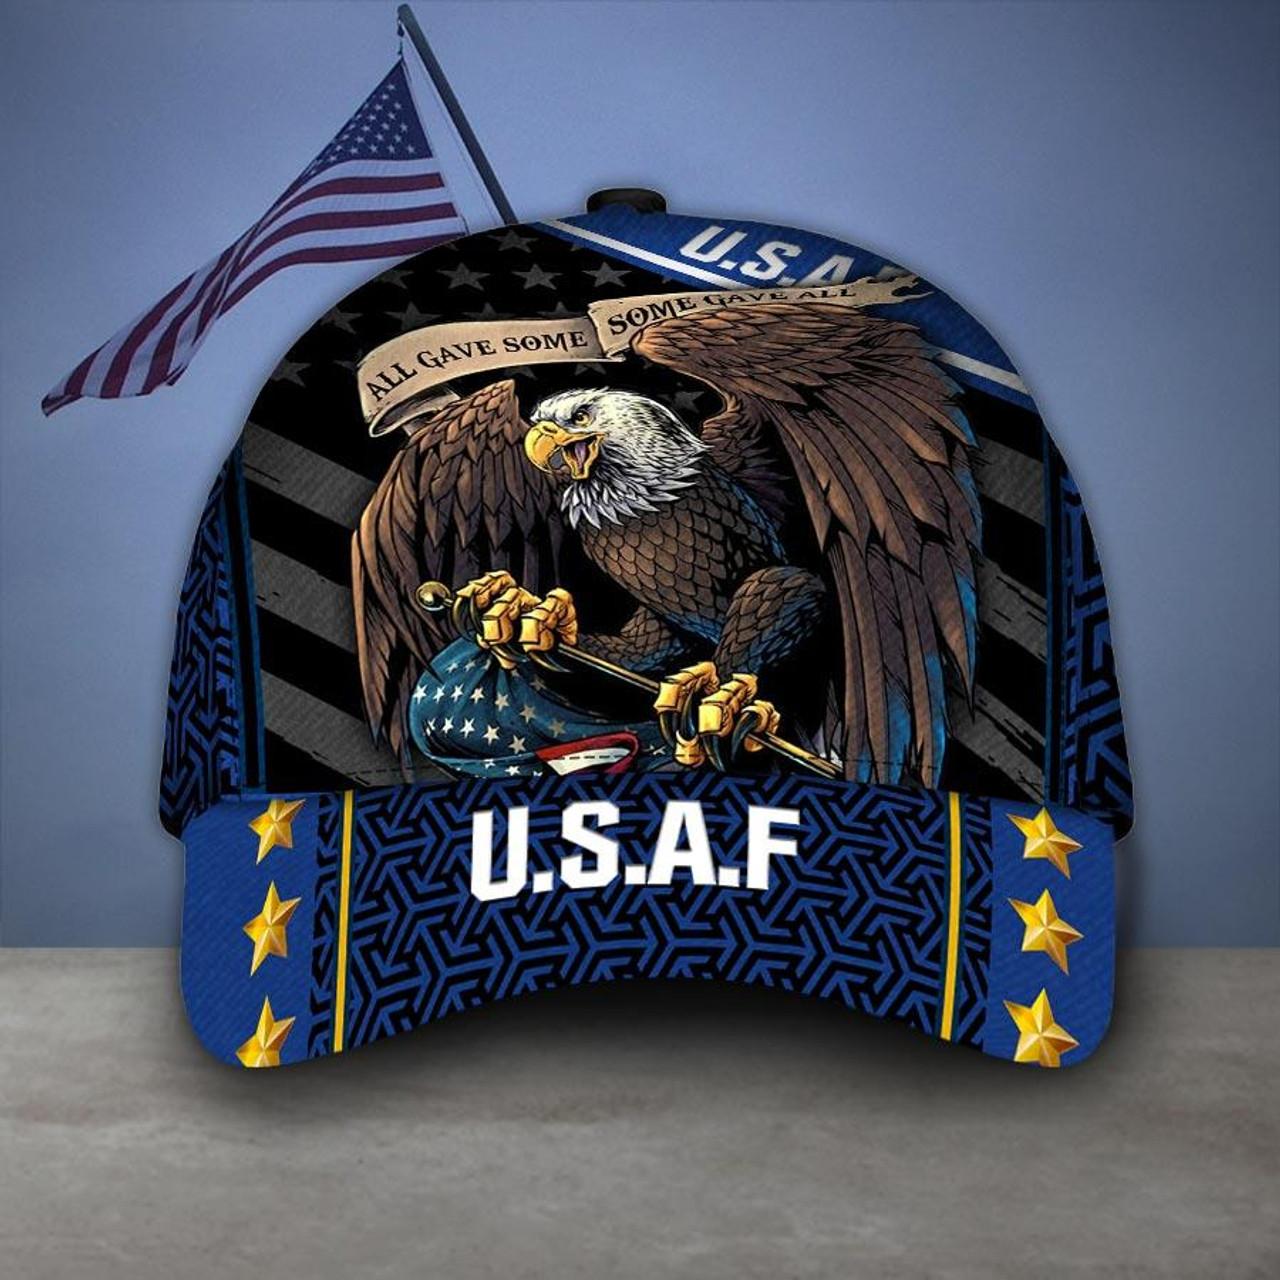 **(OFFICIAL-U.S.AIR-FORCE-VETERANS-HATS/CUSTOM-3D-GRAPHIC-PRINTED-PATRIOTIC-BIG-WINGED-BALD-EAGLE-DESIGN)**